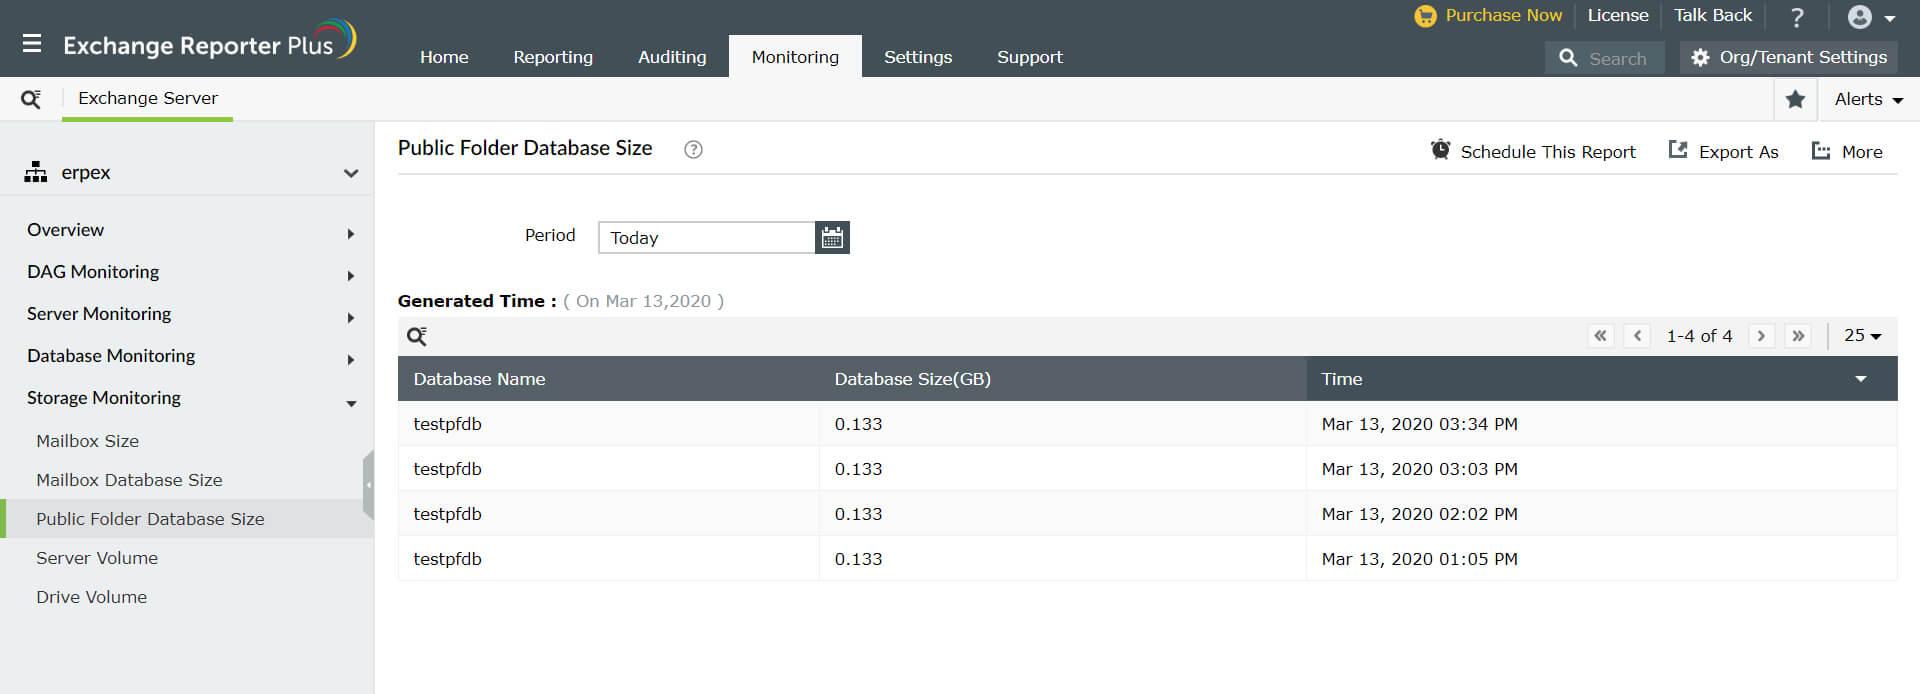 Exchange Storage Monitoring Exchangereporter Plus